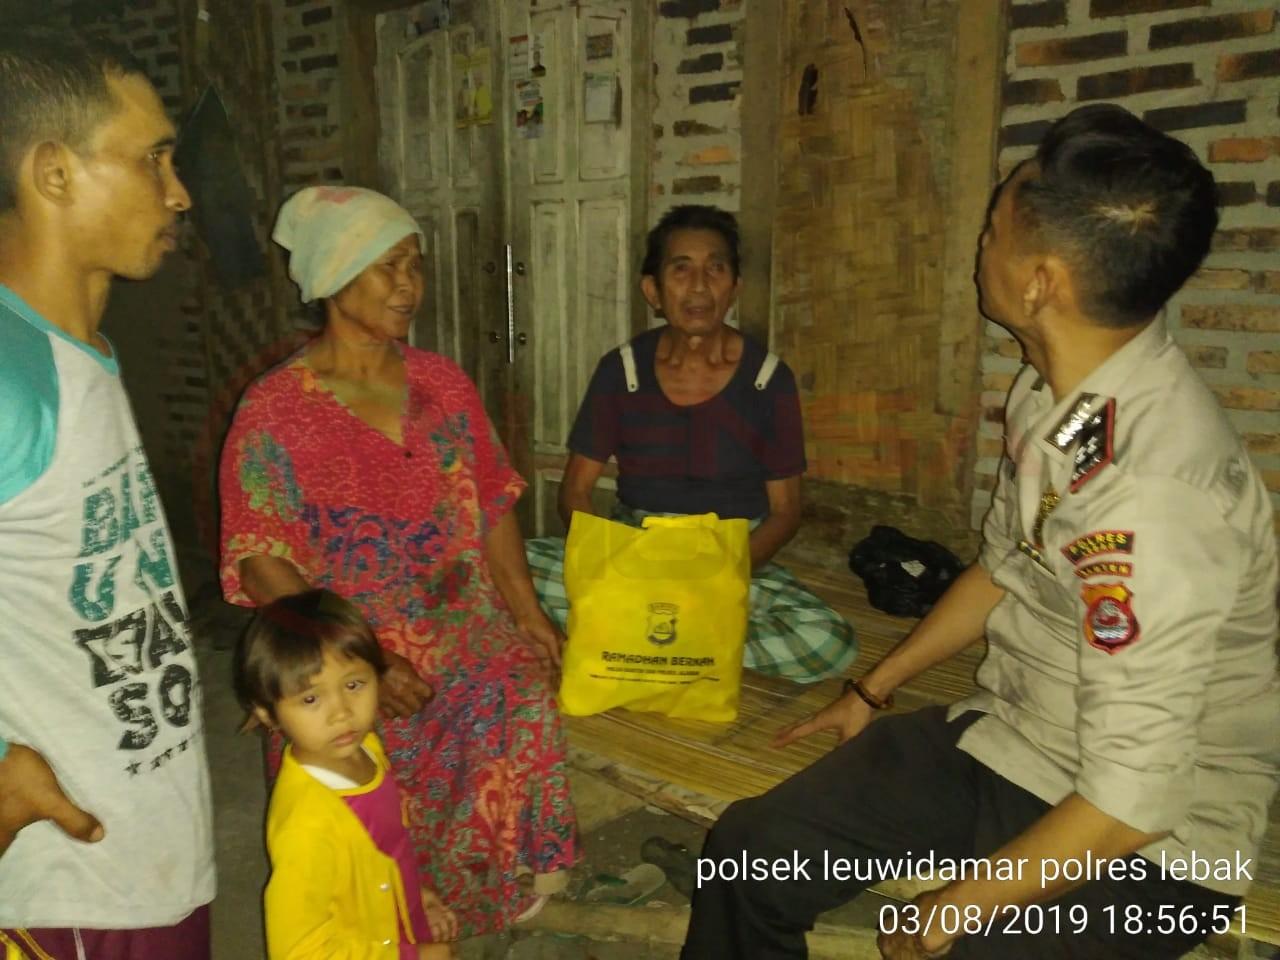 LensaHukum.co.id - IMG 20190804 WA0090 - Pasca Gempa Polres Lebak Patroli Ke Perumahan Warga